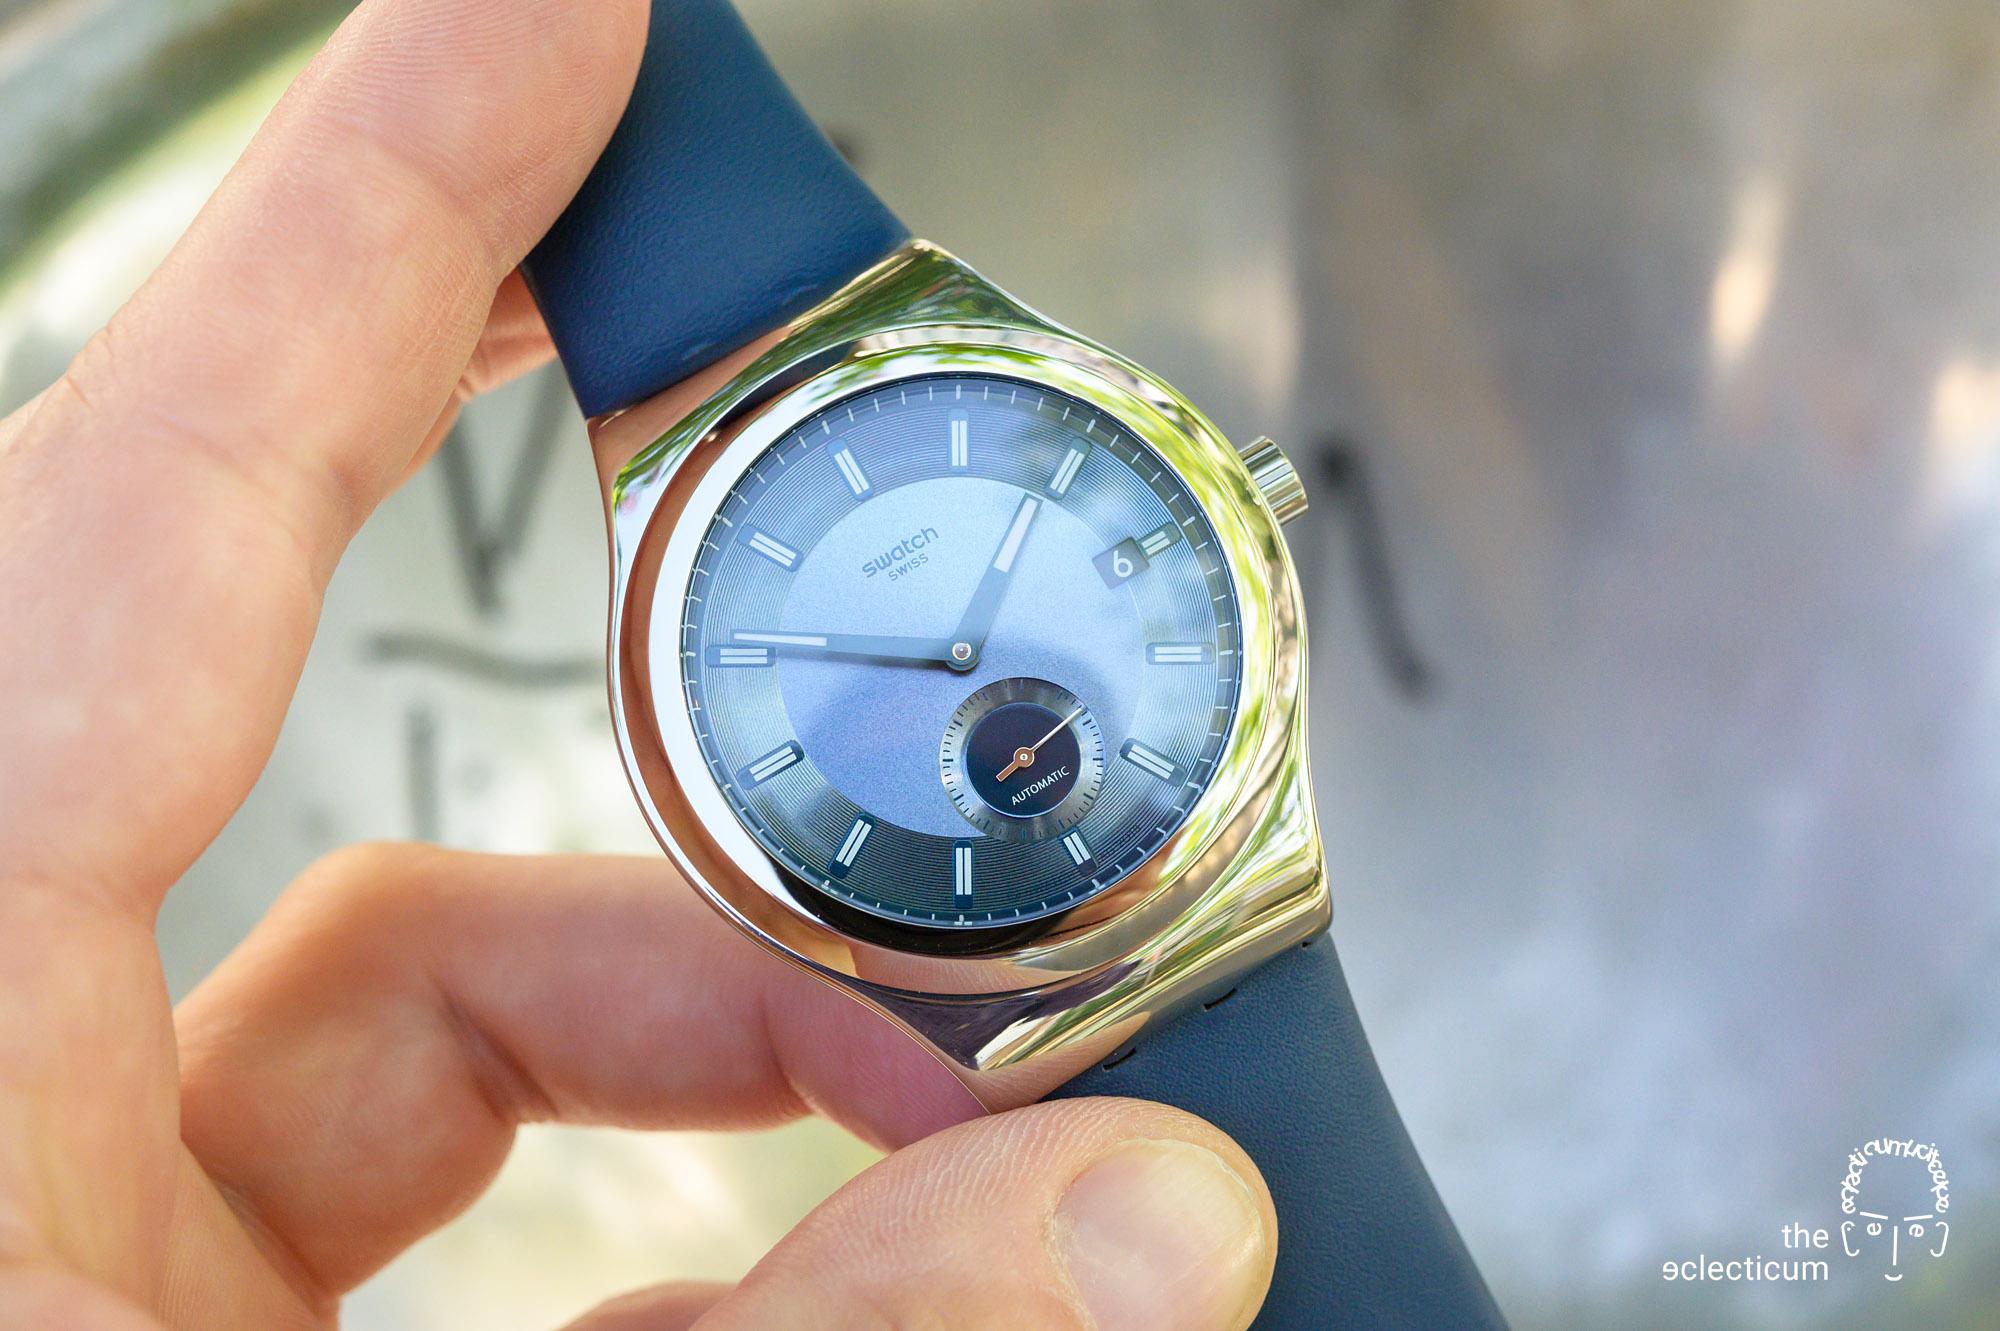 Swatch Sistem51 Petite Seconde automatic blue dial